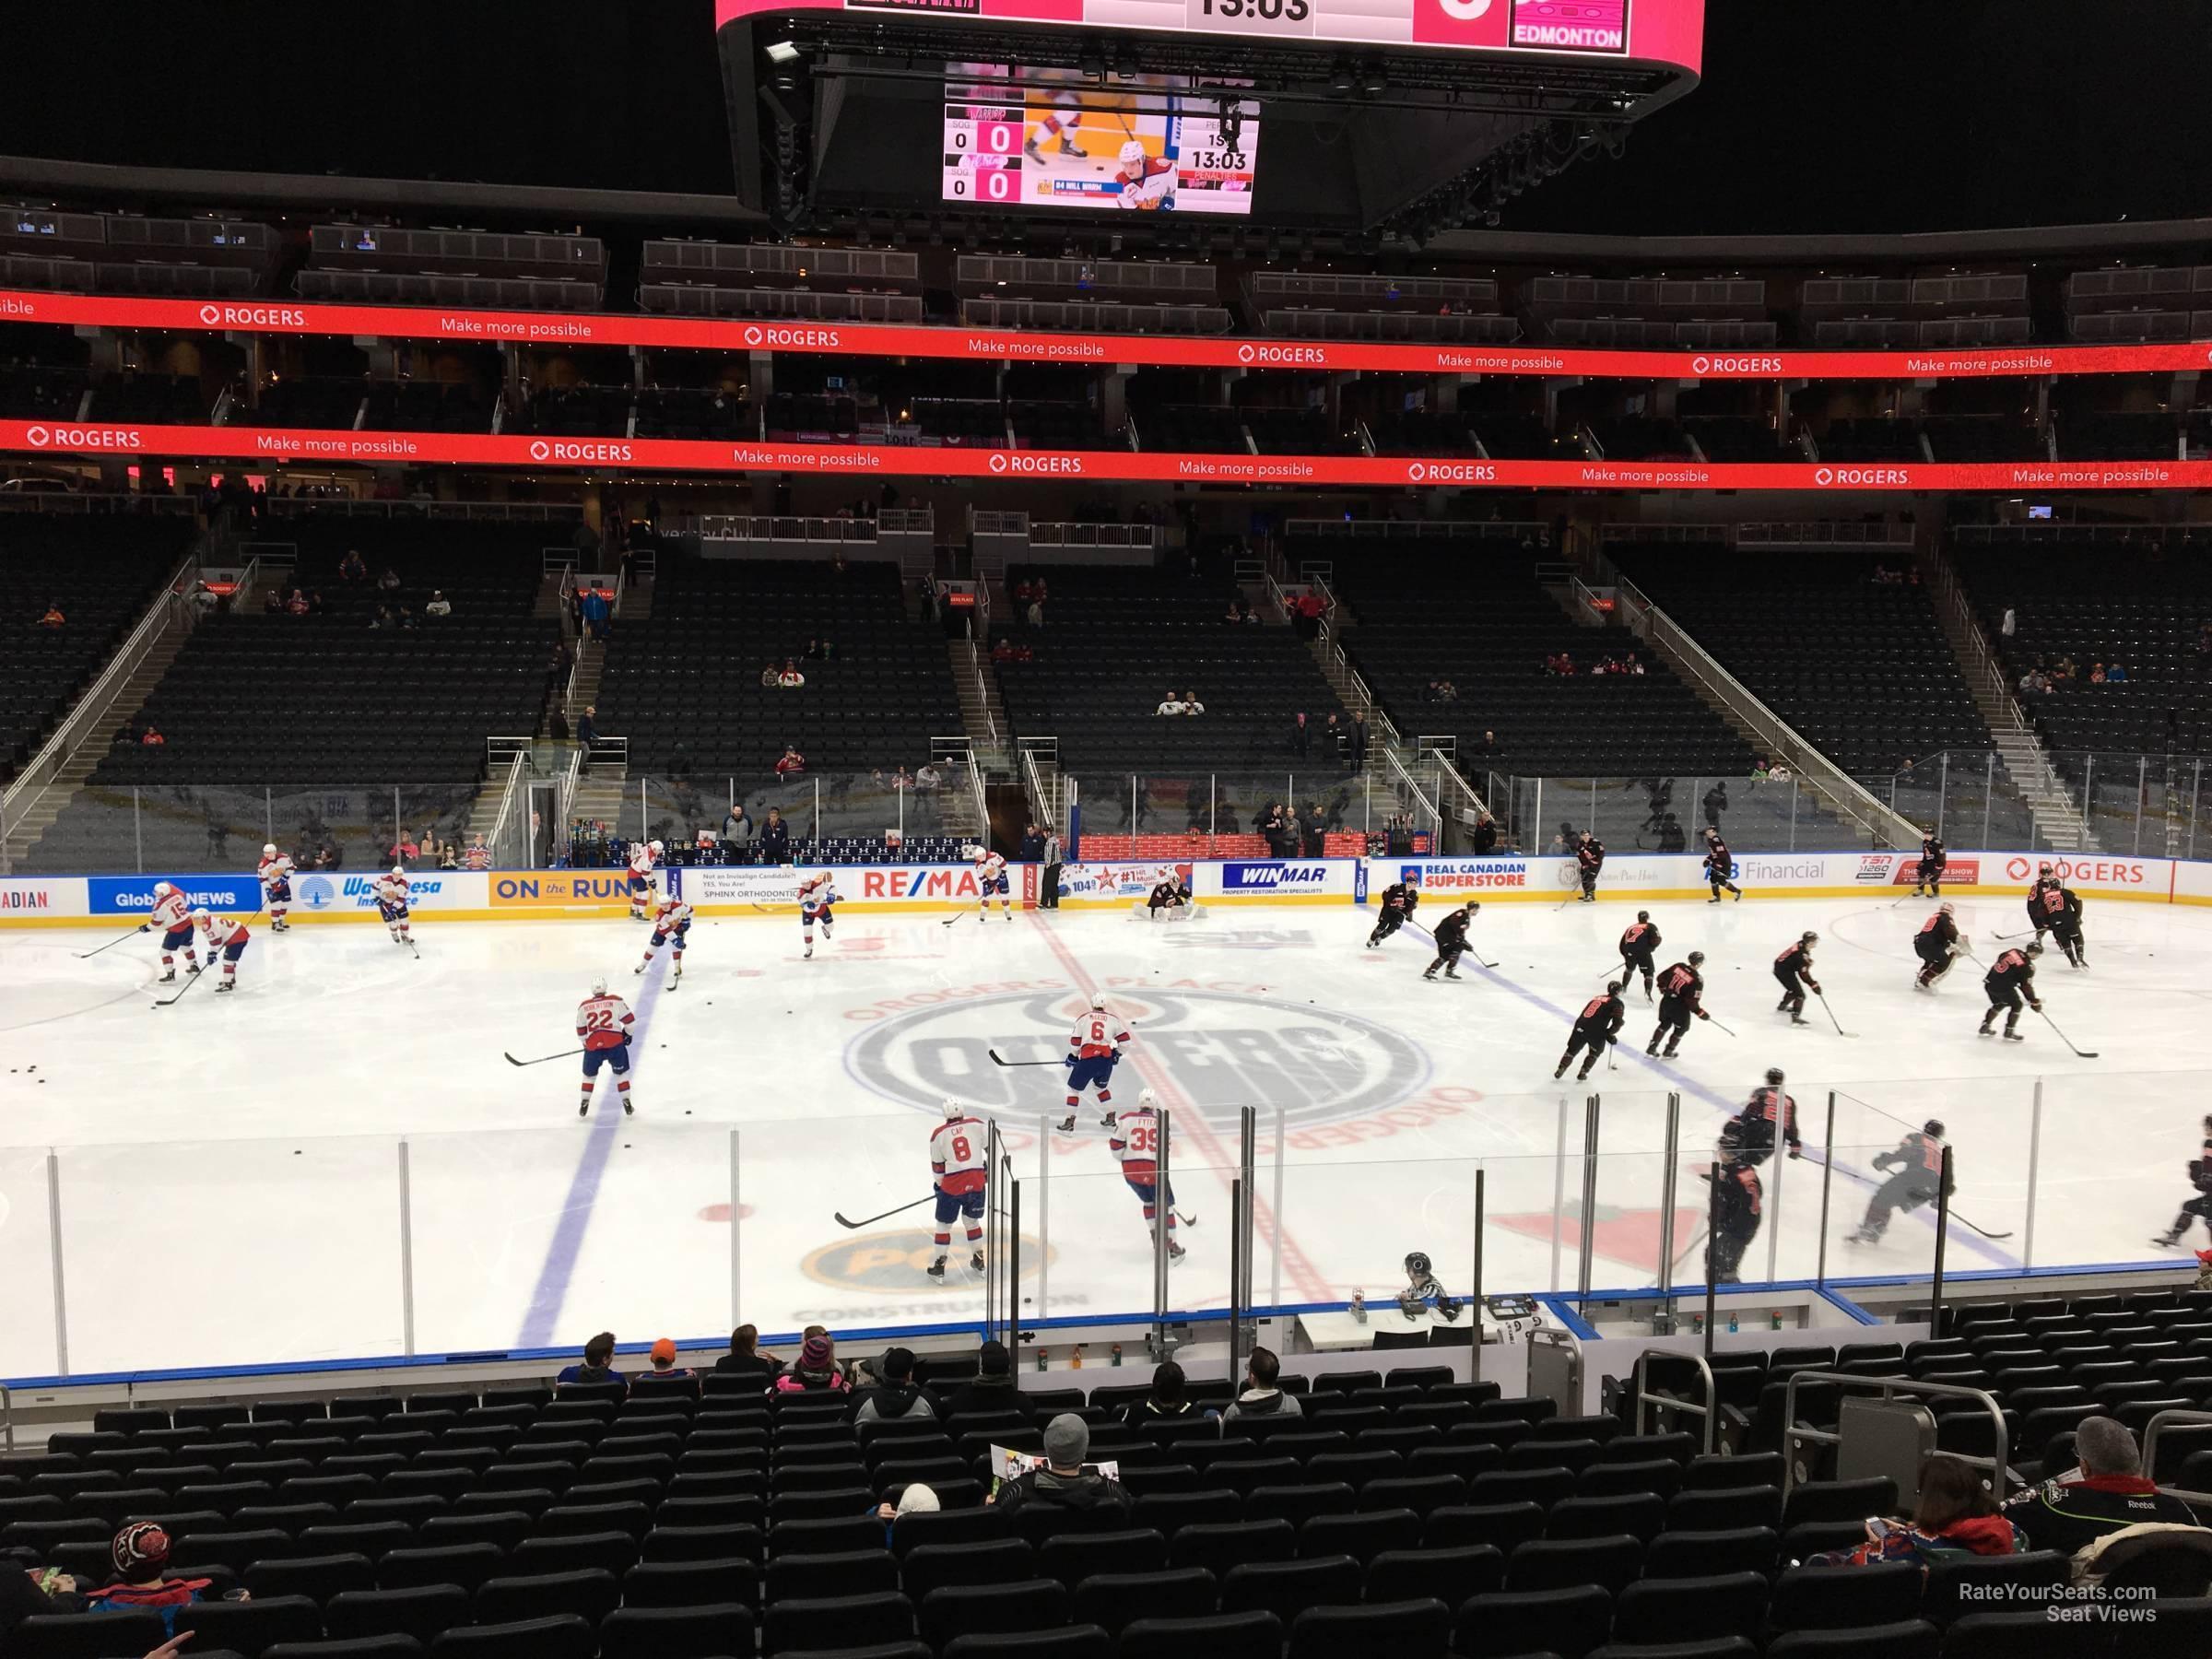 Rogers Place Section 120 - Edmonton Oilers - RateYourSeats.com